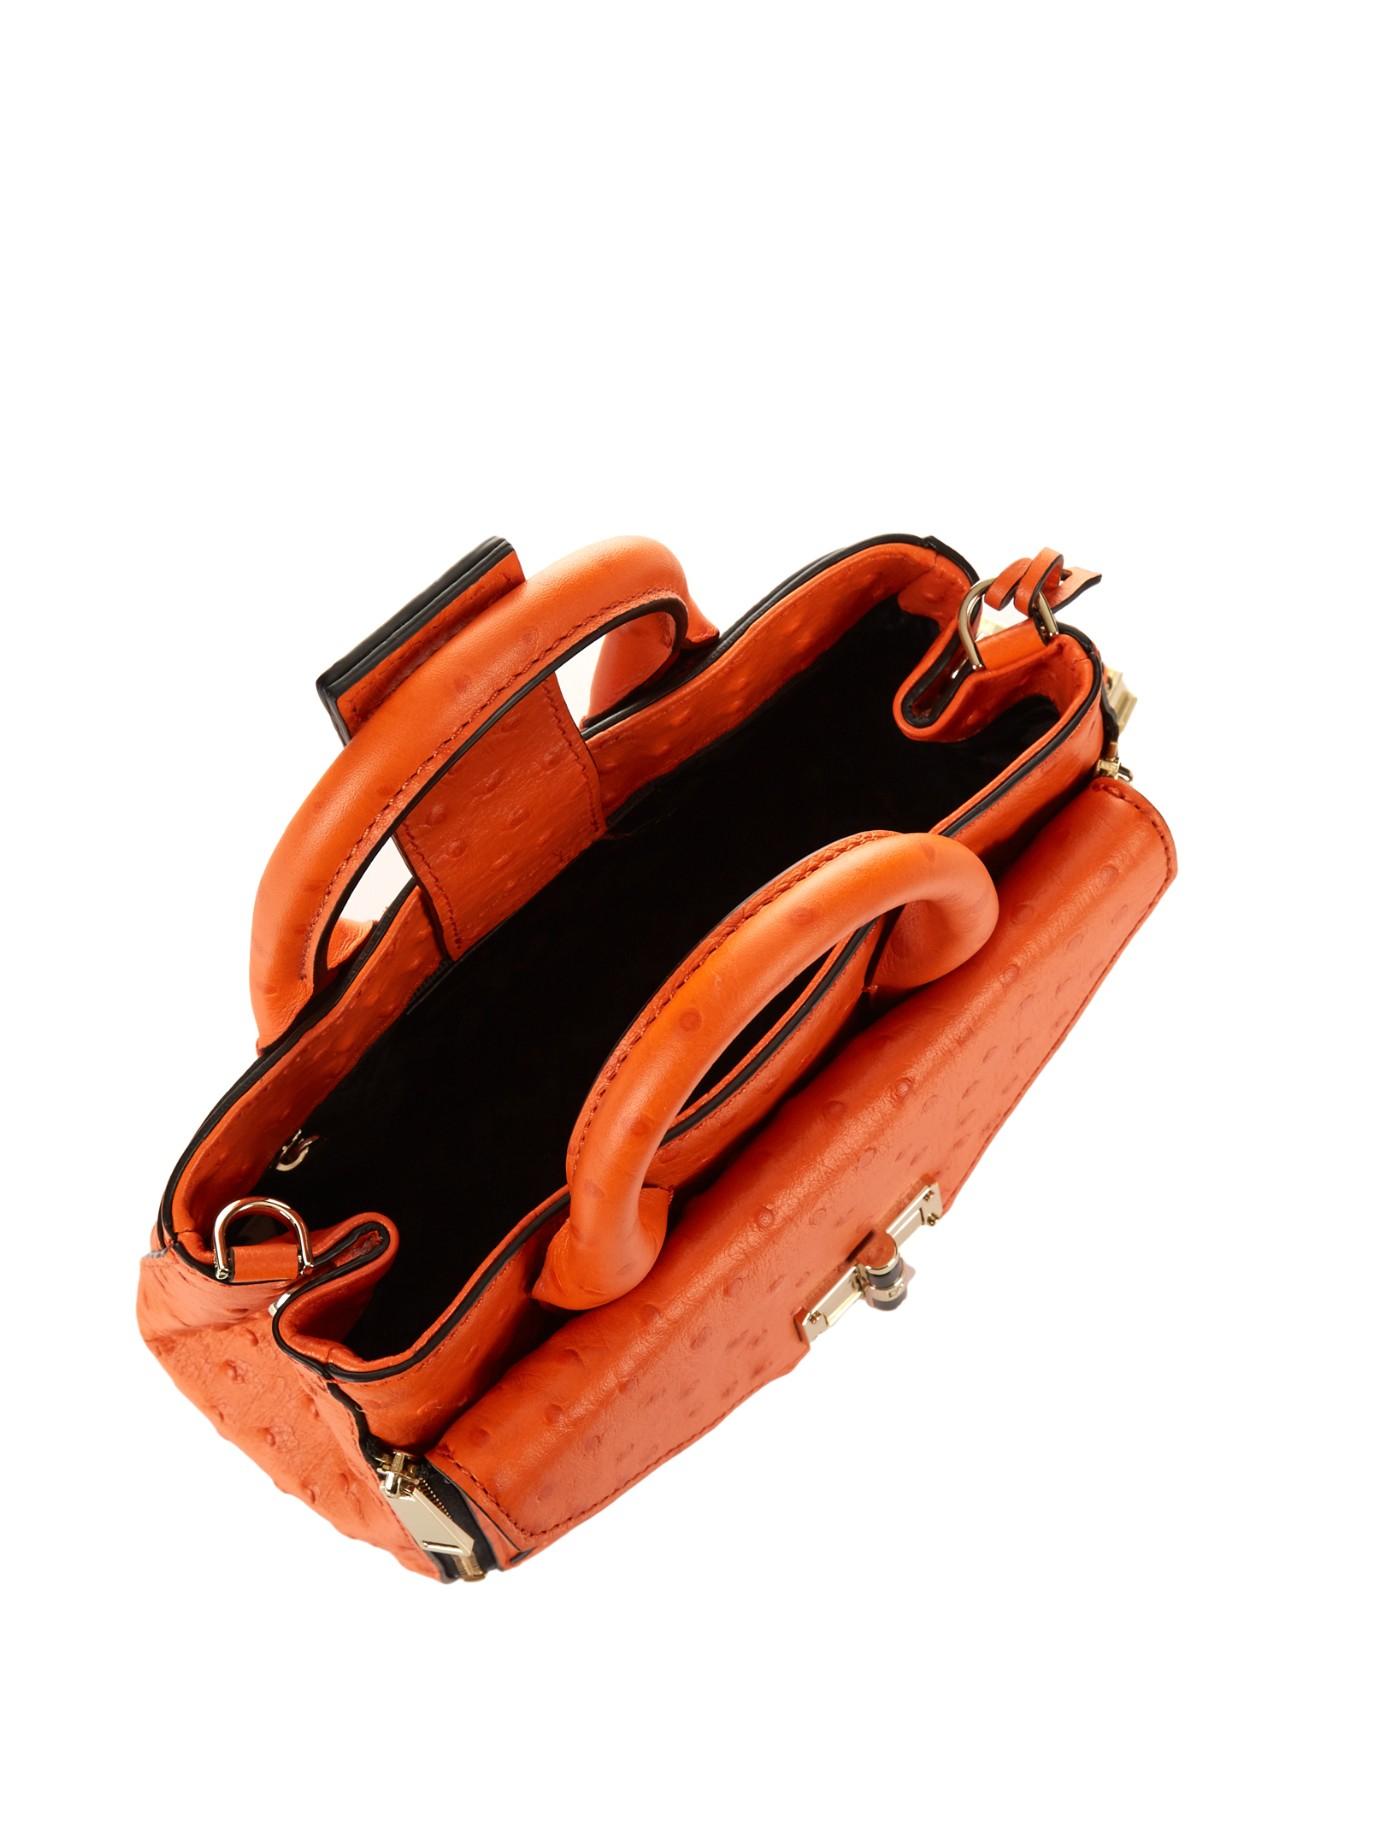 Diane von Furstenberg Leather Mini Secret Agent Cross-Body Bag in Orange